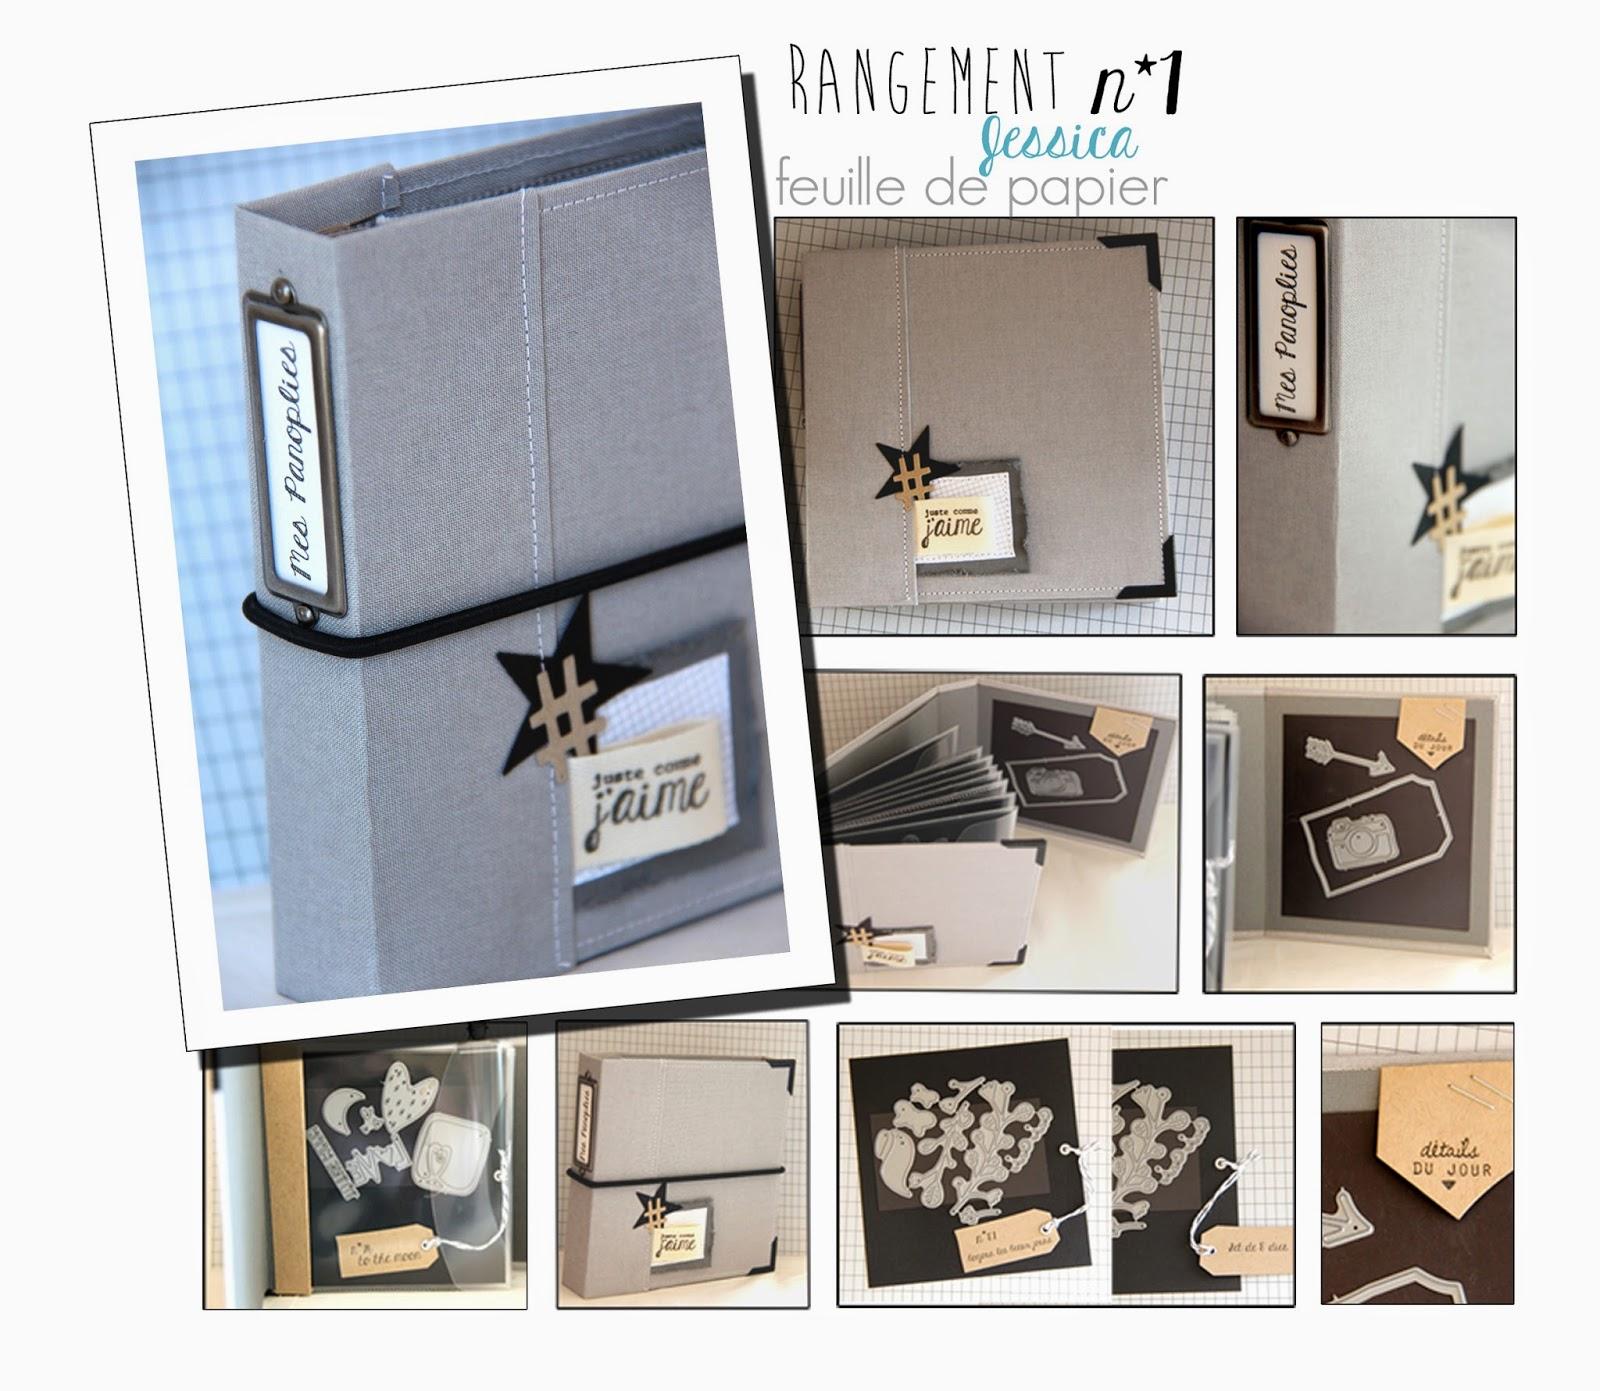 feuille de papier scrapbooking rangement de jess. Black Bedroom Furniture Sets. Home Design Ideas